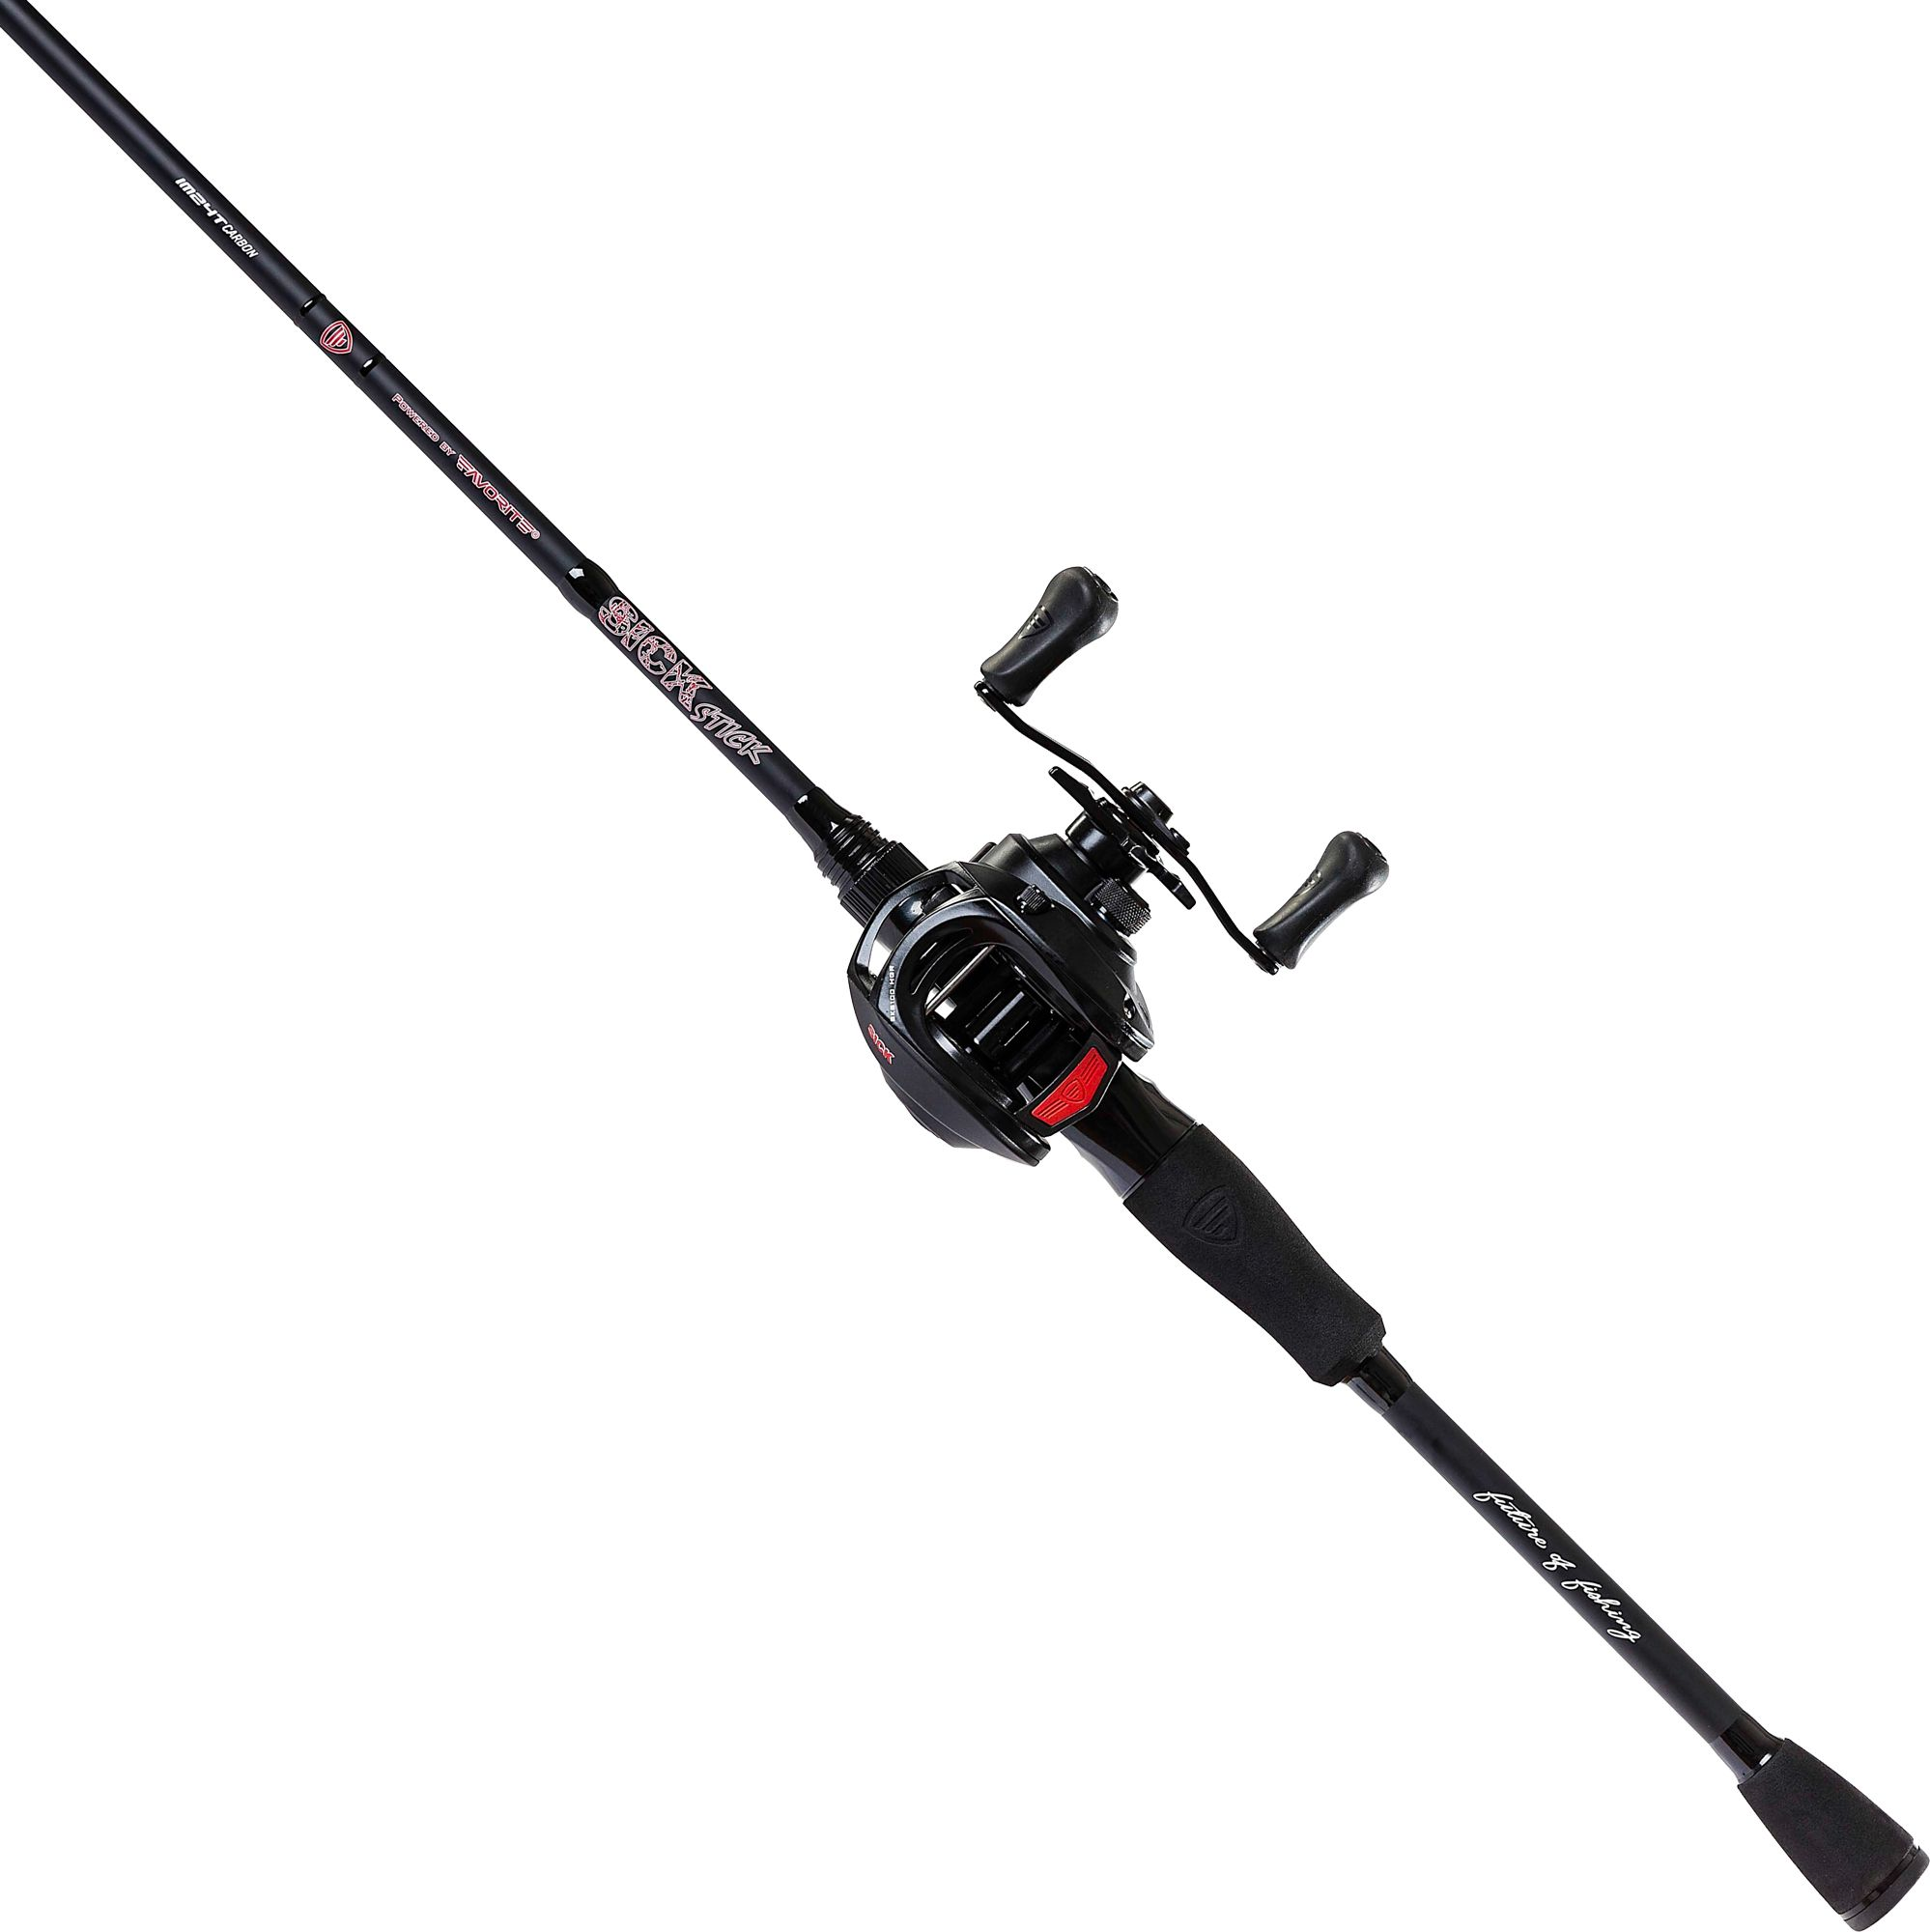 Favorite Fishing USA Sick Stick Casting Combo, Aluminum